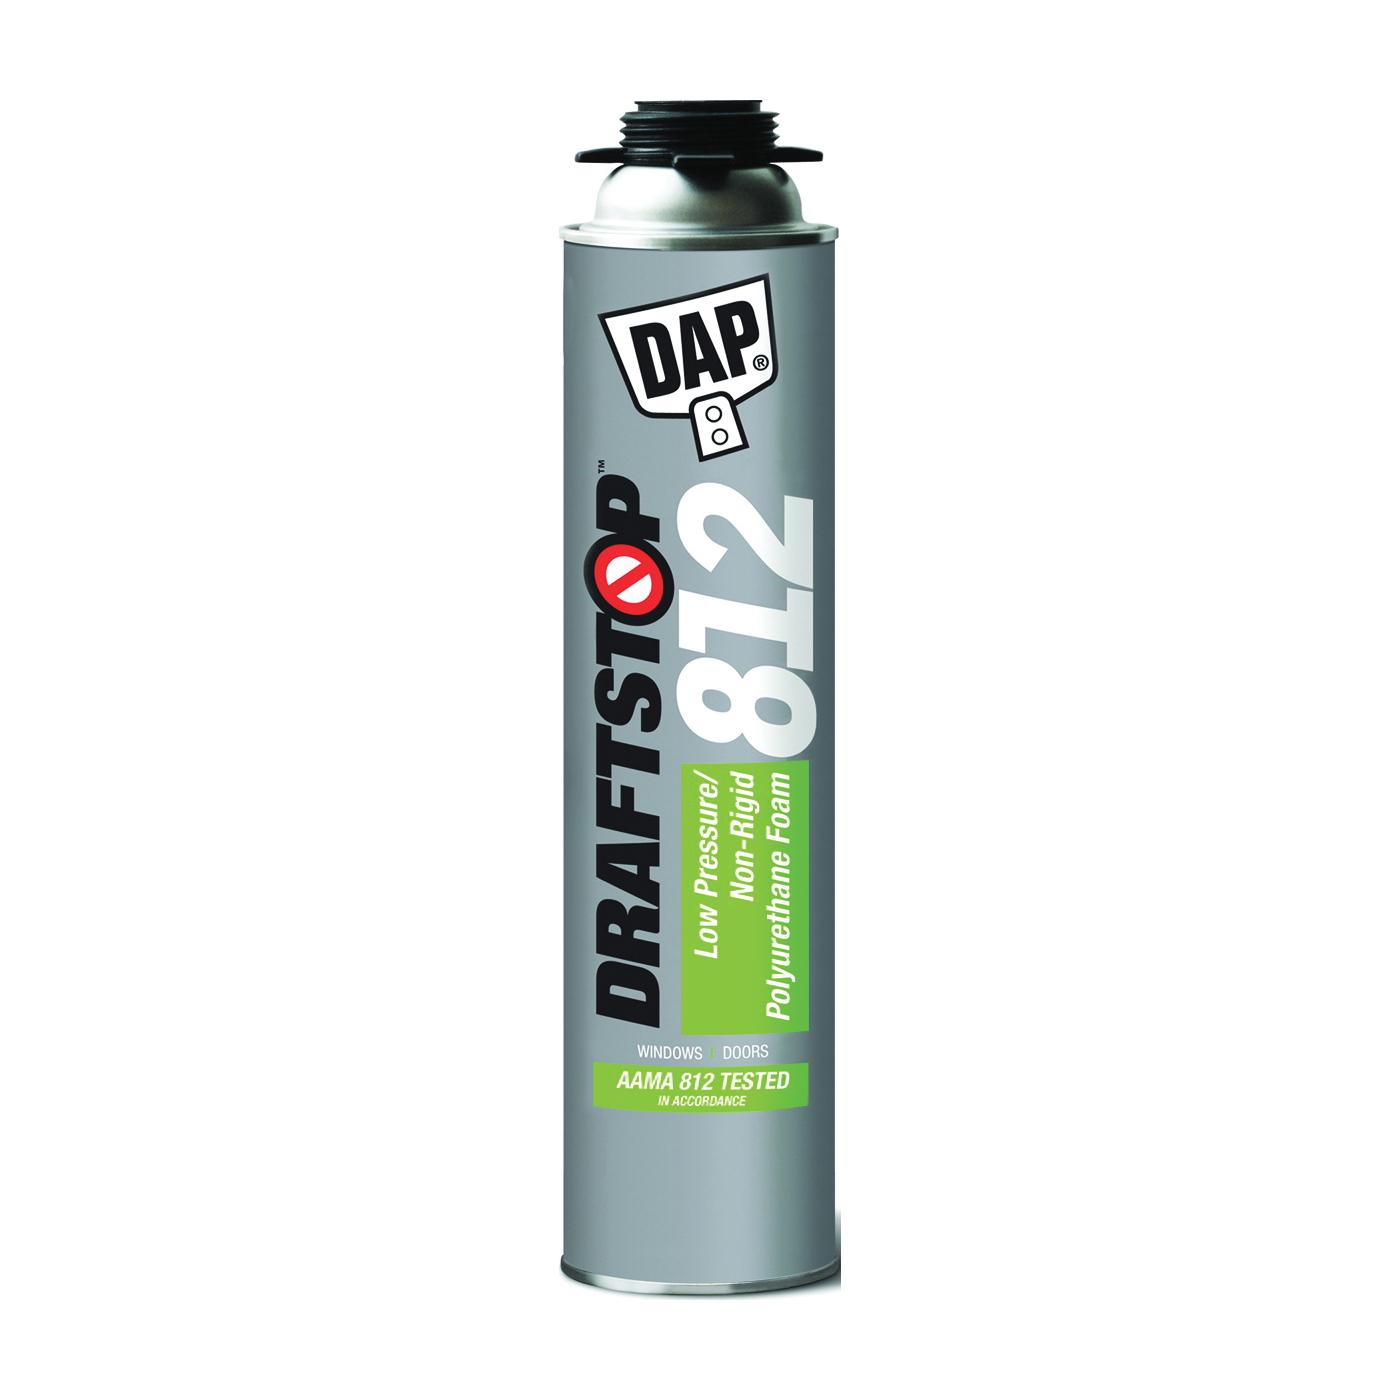 Picture of DAP 80812 Foam Sealant, White, 26 oz Package, Aerosol Can